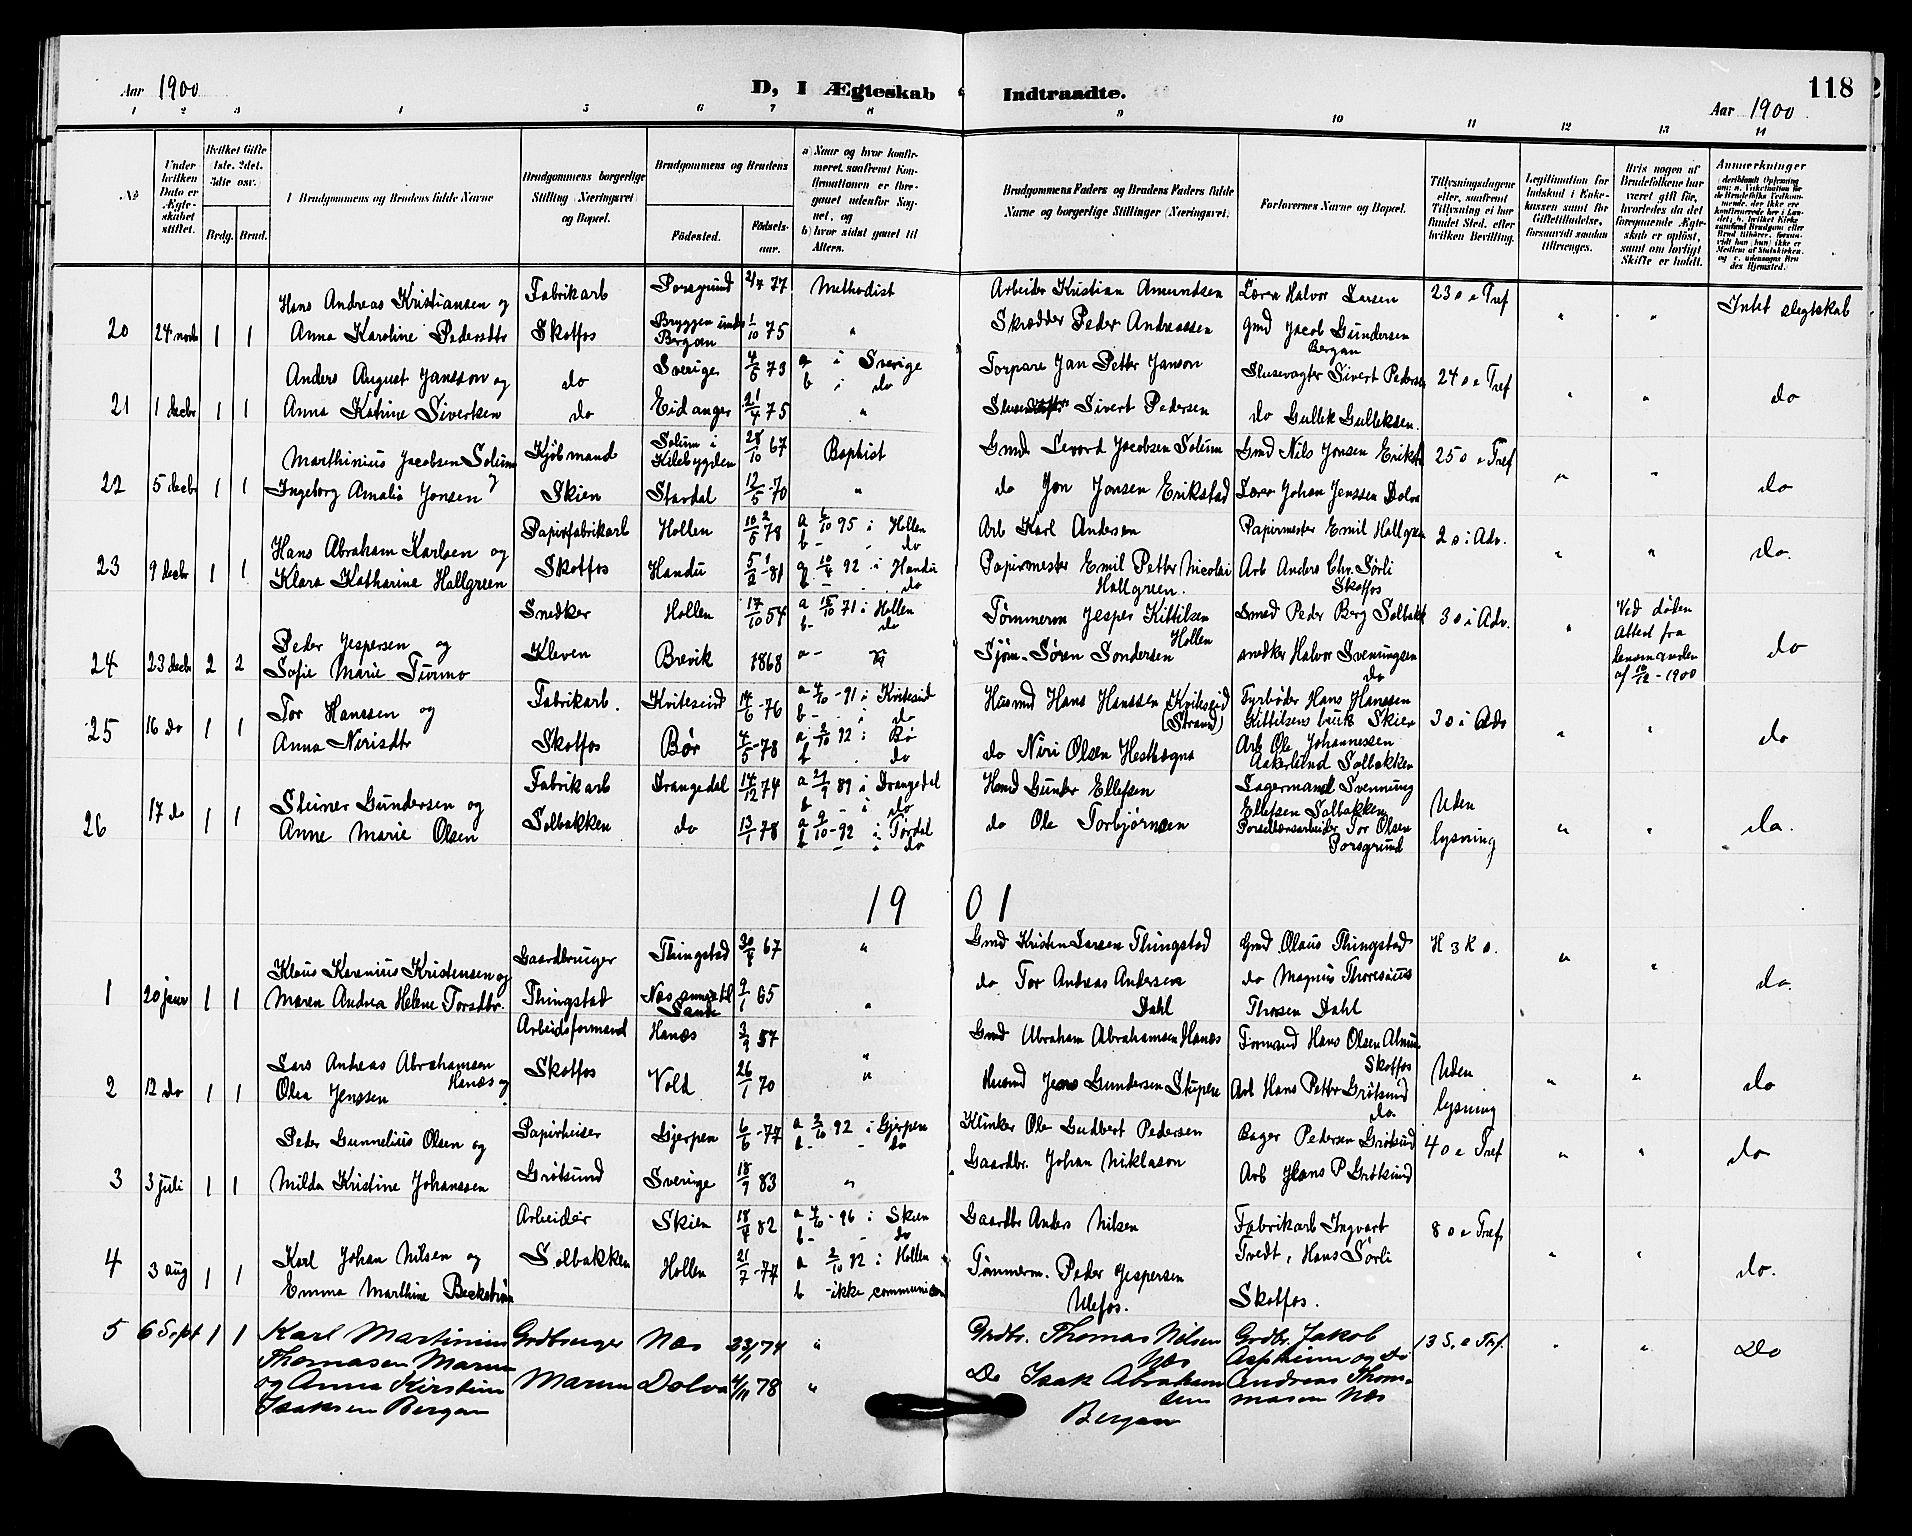 SAKO, Solum kirkebøker, G/Gb/L0004: Klokkerbok nr. II 4, 1898-1905, s. 118